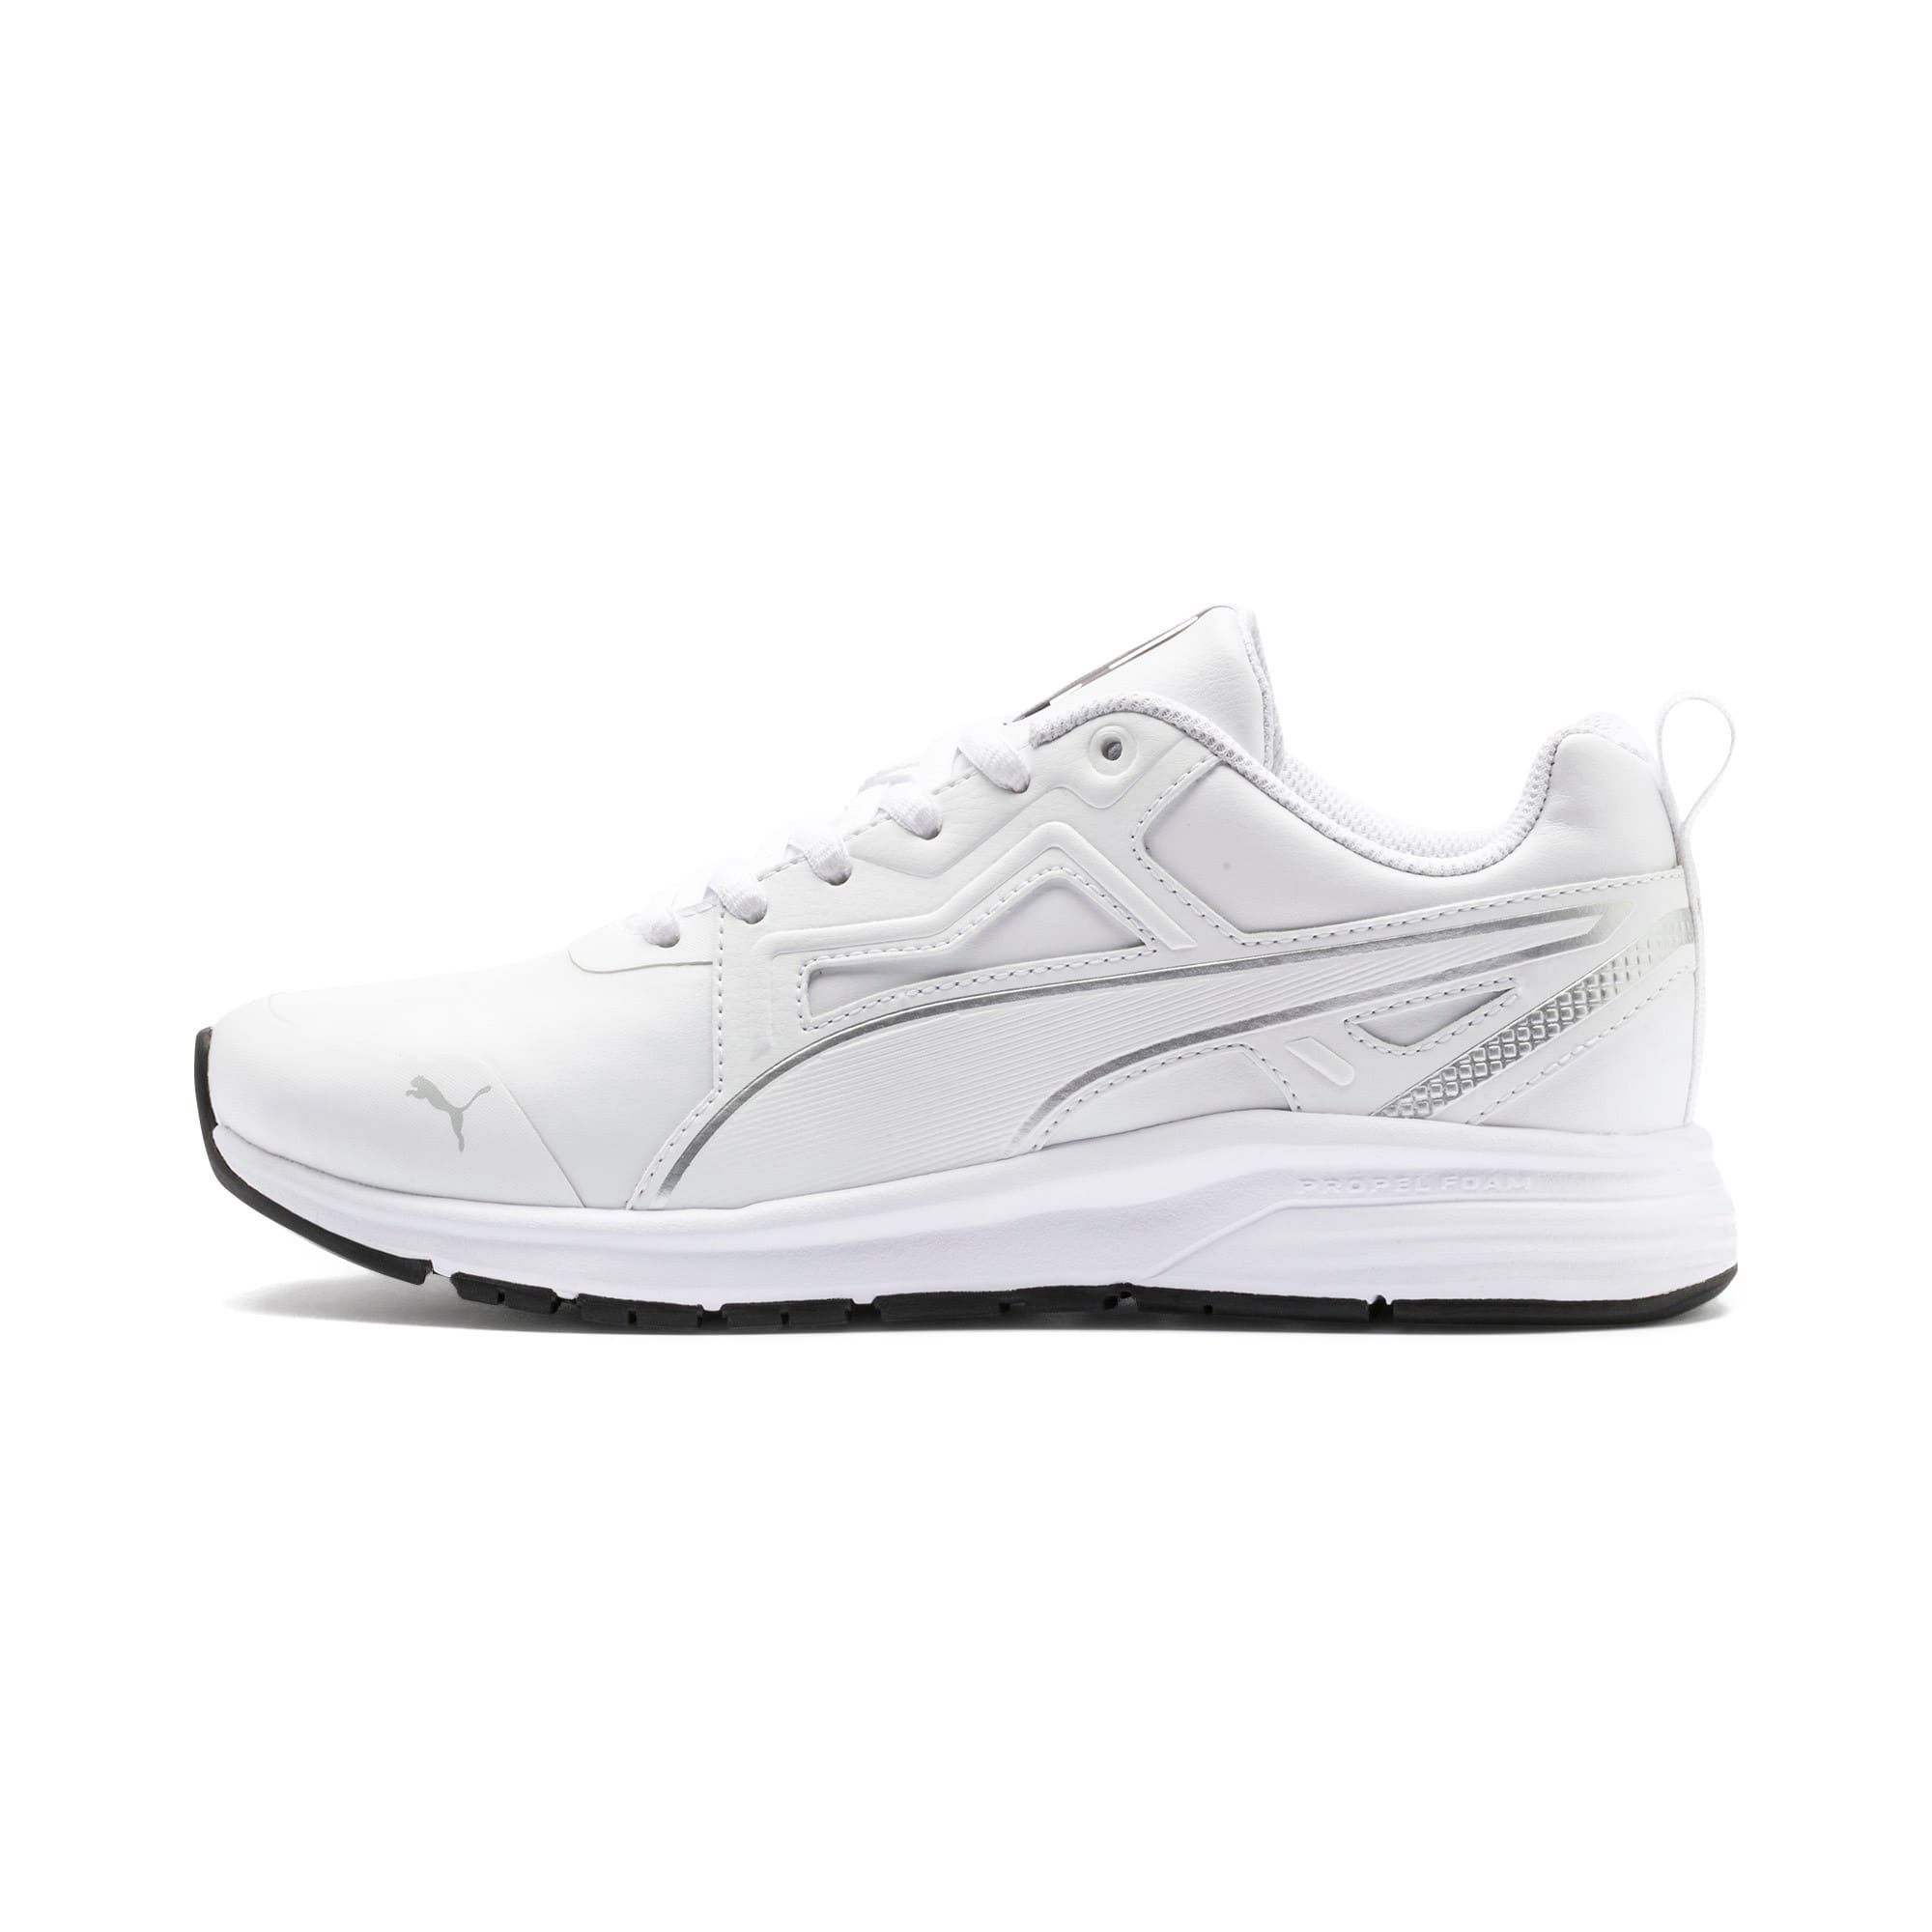 Thumbnail 1 of Pure Jogger SL Sneakers JR, White-Silver-Black-G Violet, medium